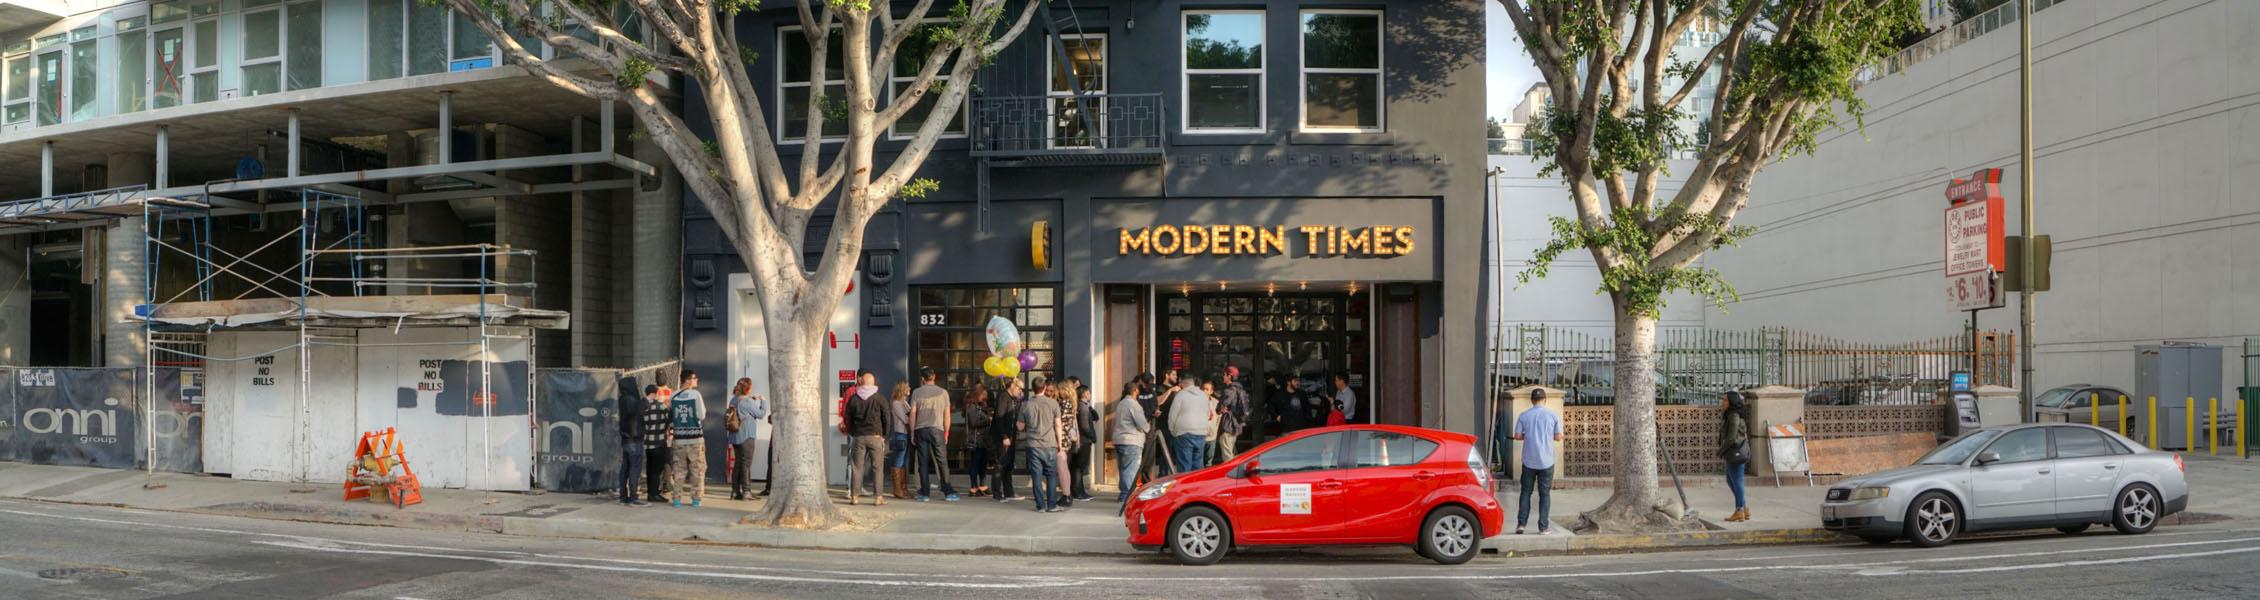 Modern Times The Dankness Dojo Exterior